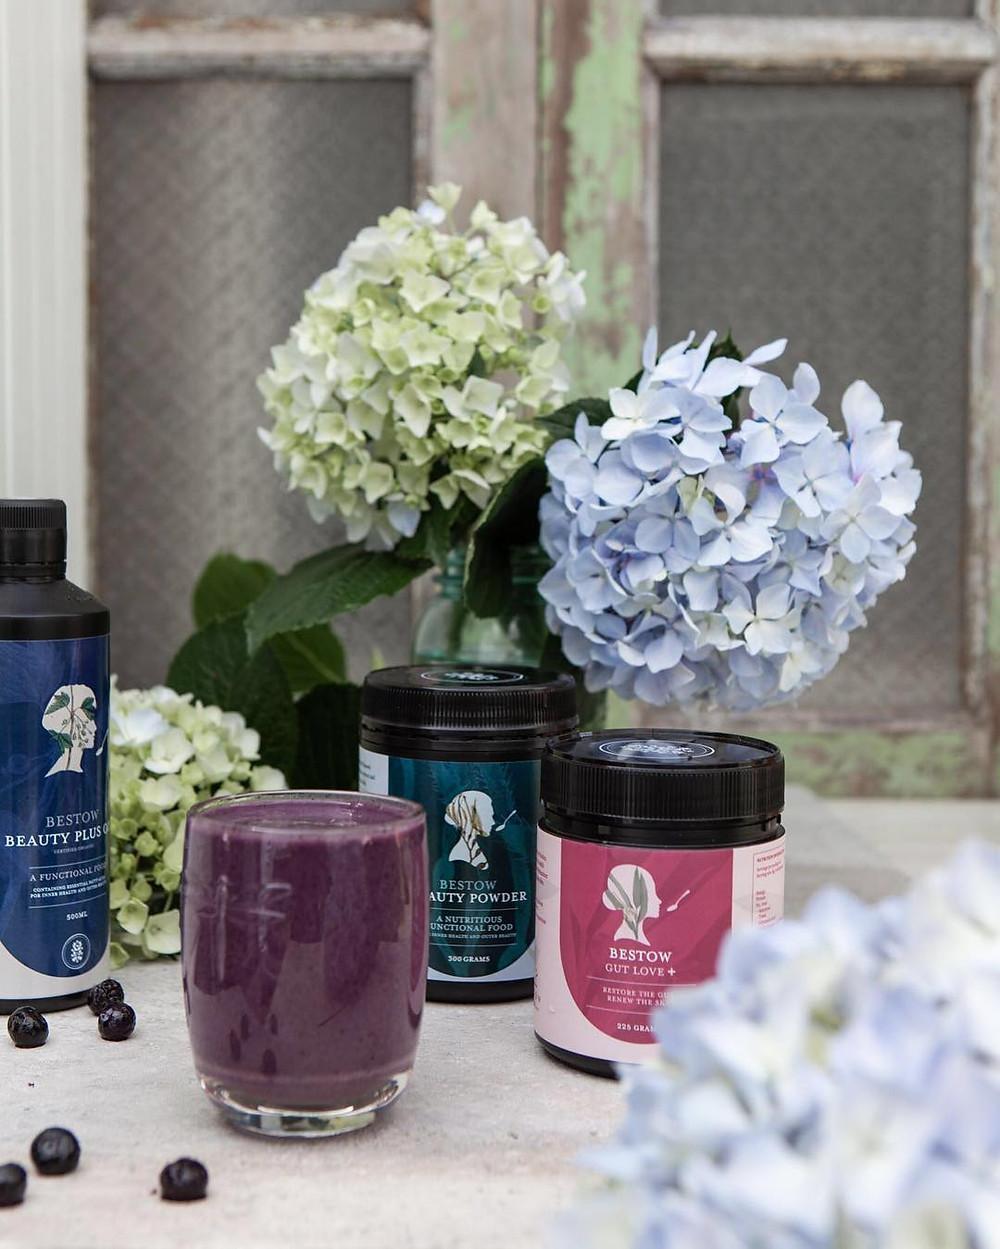 Bestow Beauty Internal Products